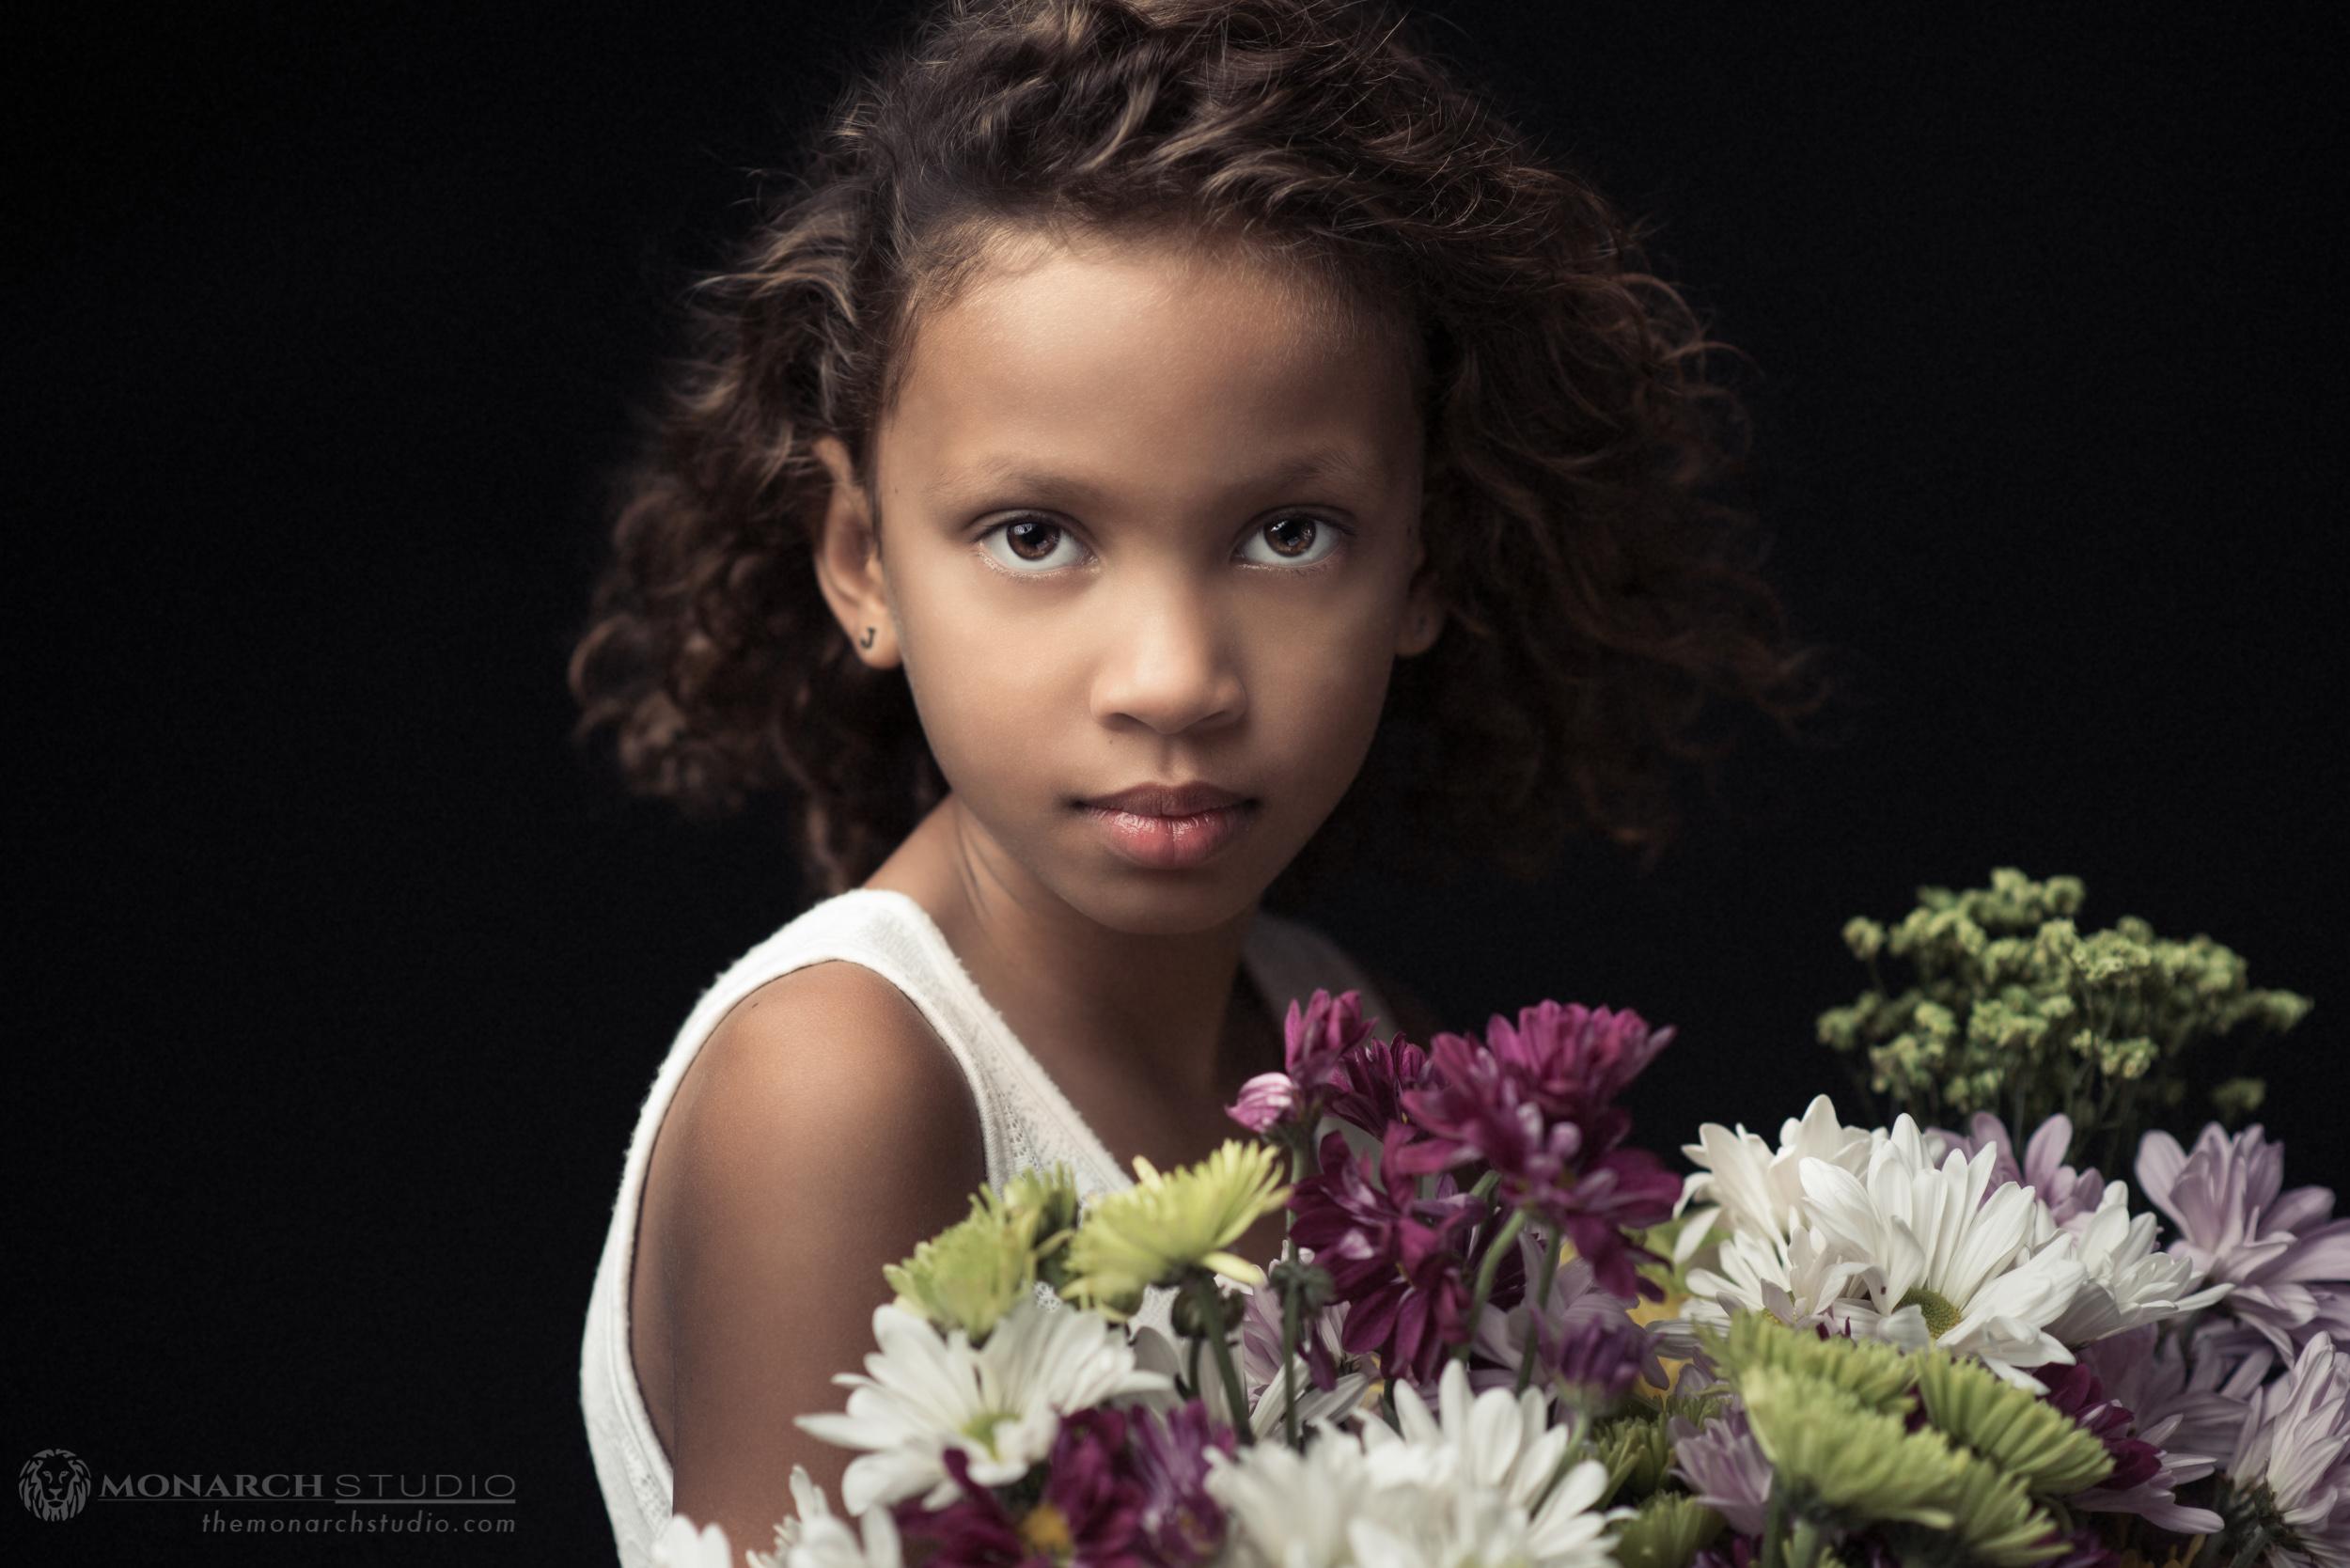 Fine-Art-Childrens-Photographer-9.jpg